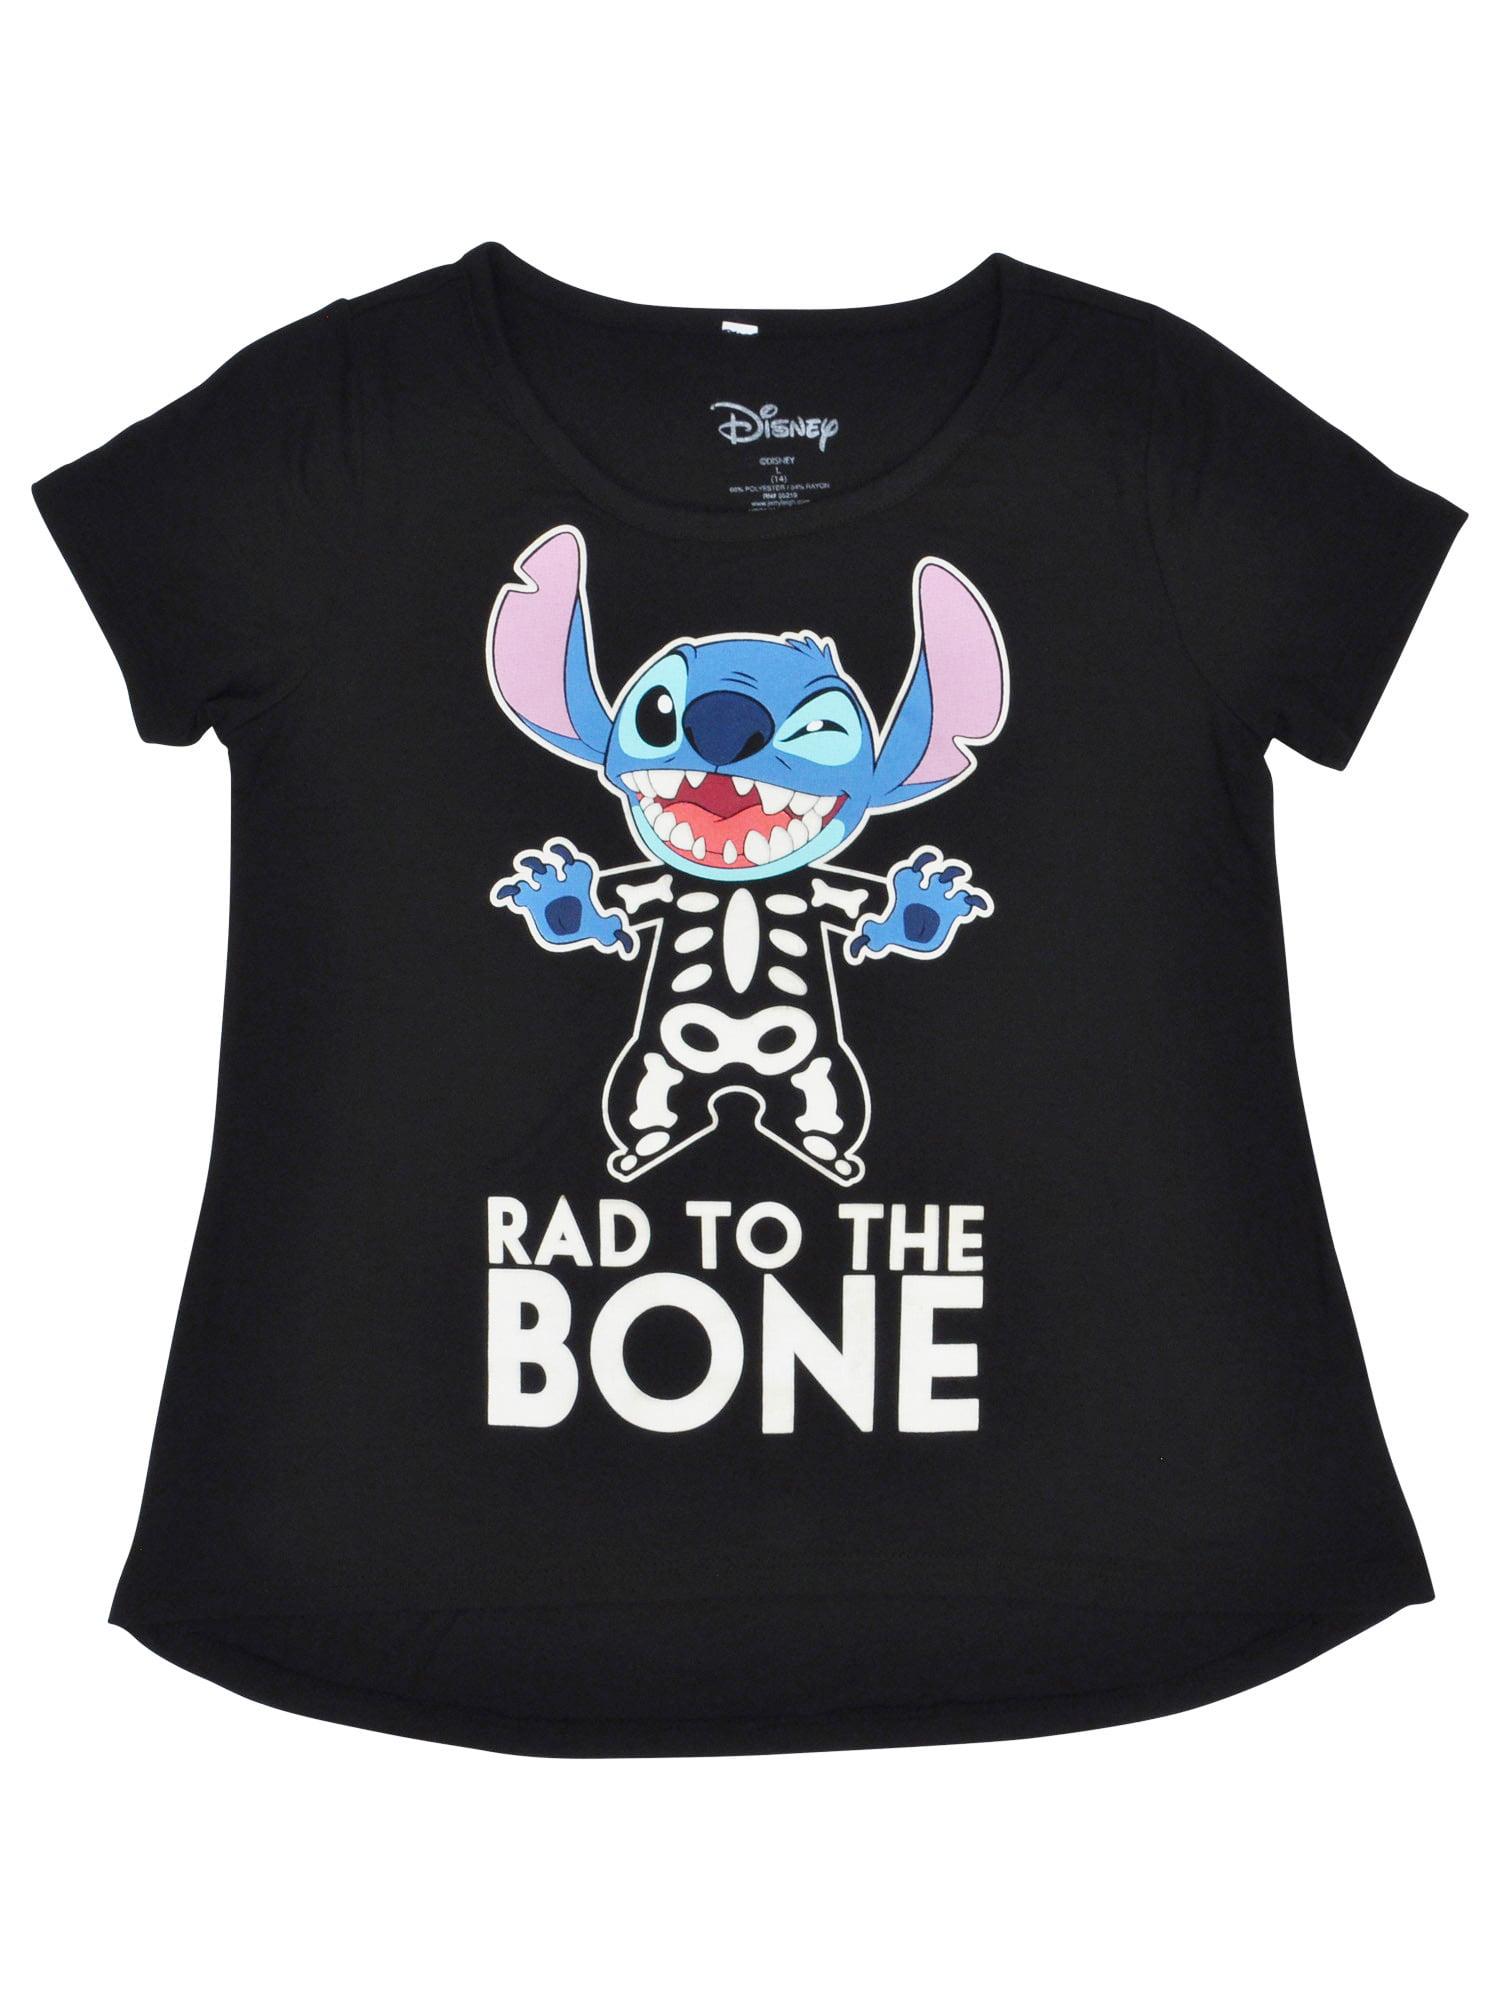 Youth Girls Stitch Skeleton T-Shirt Black Glow-in-the-Dark